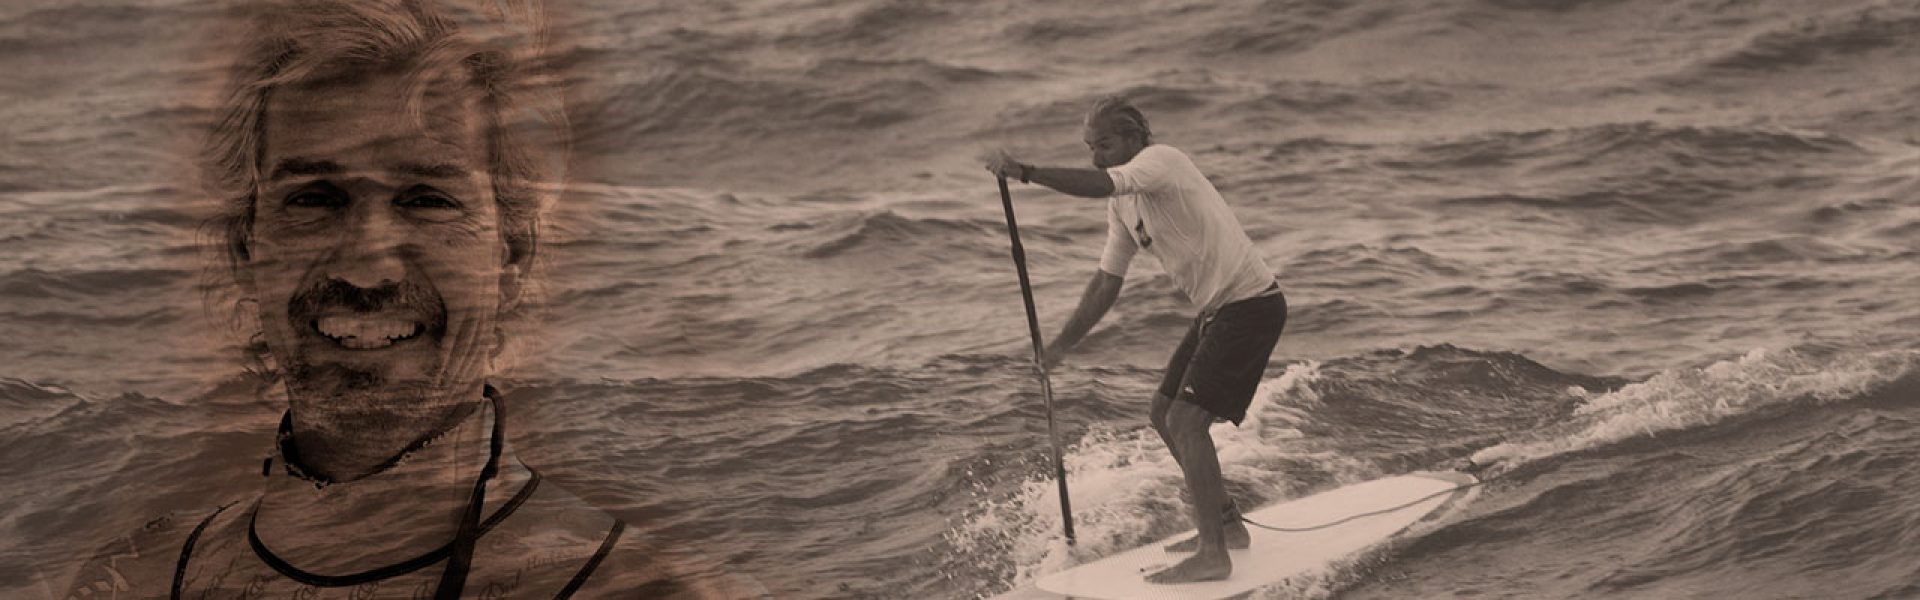 Surfcoach Diego De Alzaa